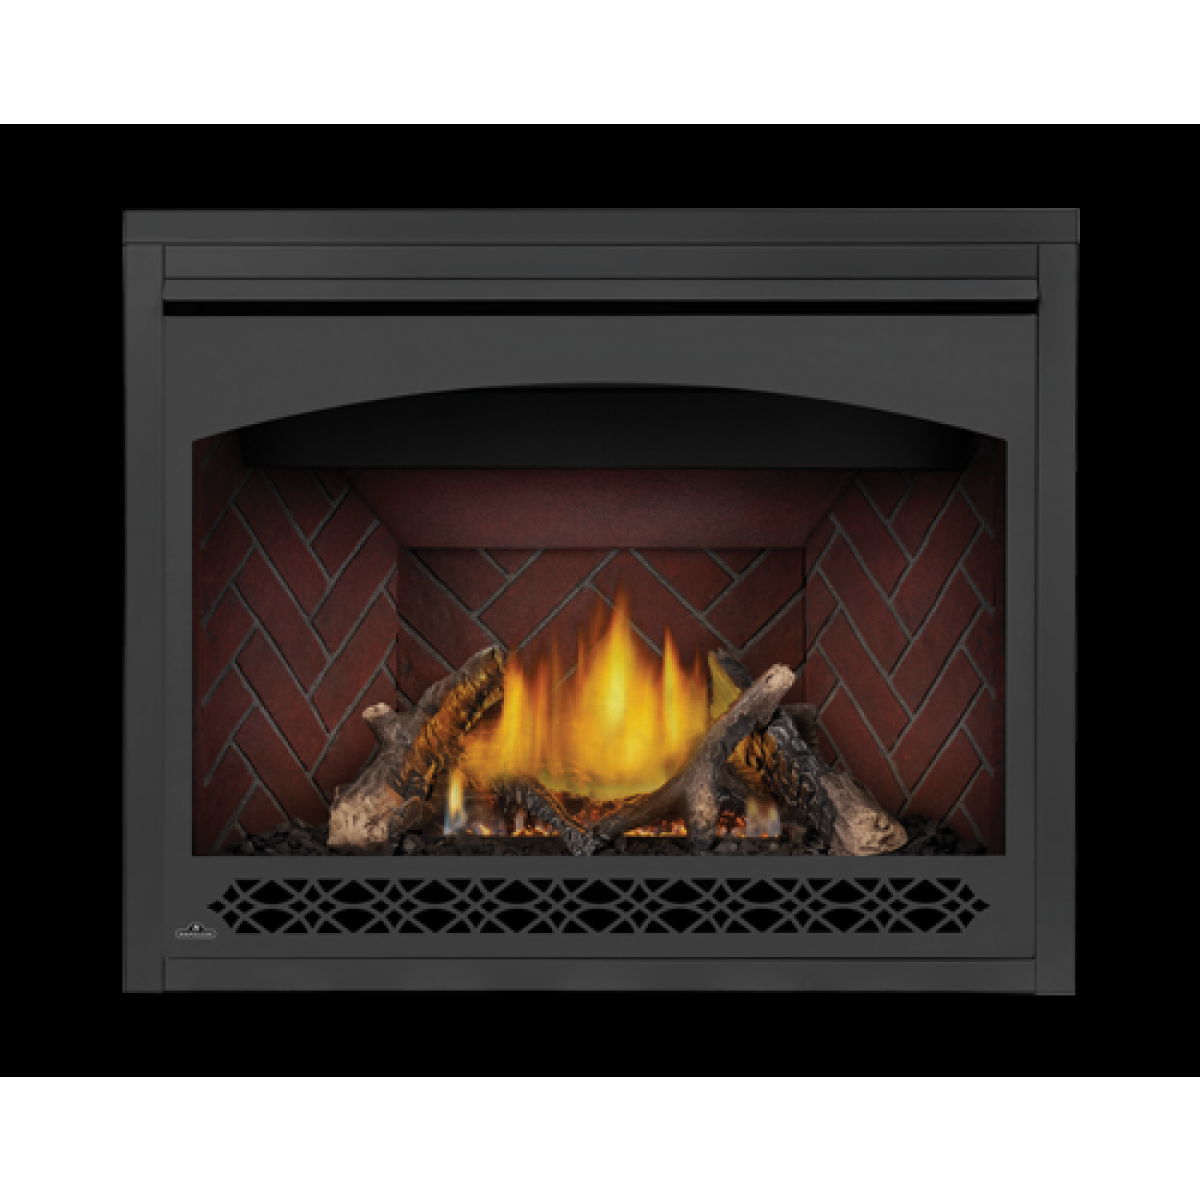 Napoleon Gx42ptre Direct Vent Propane Gas Fireplace